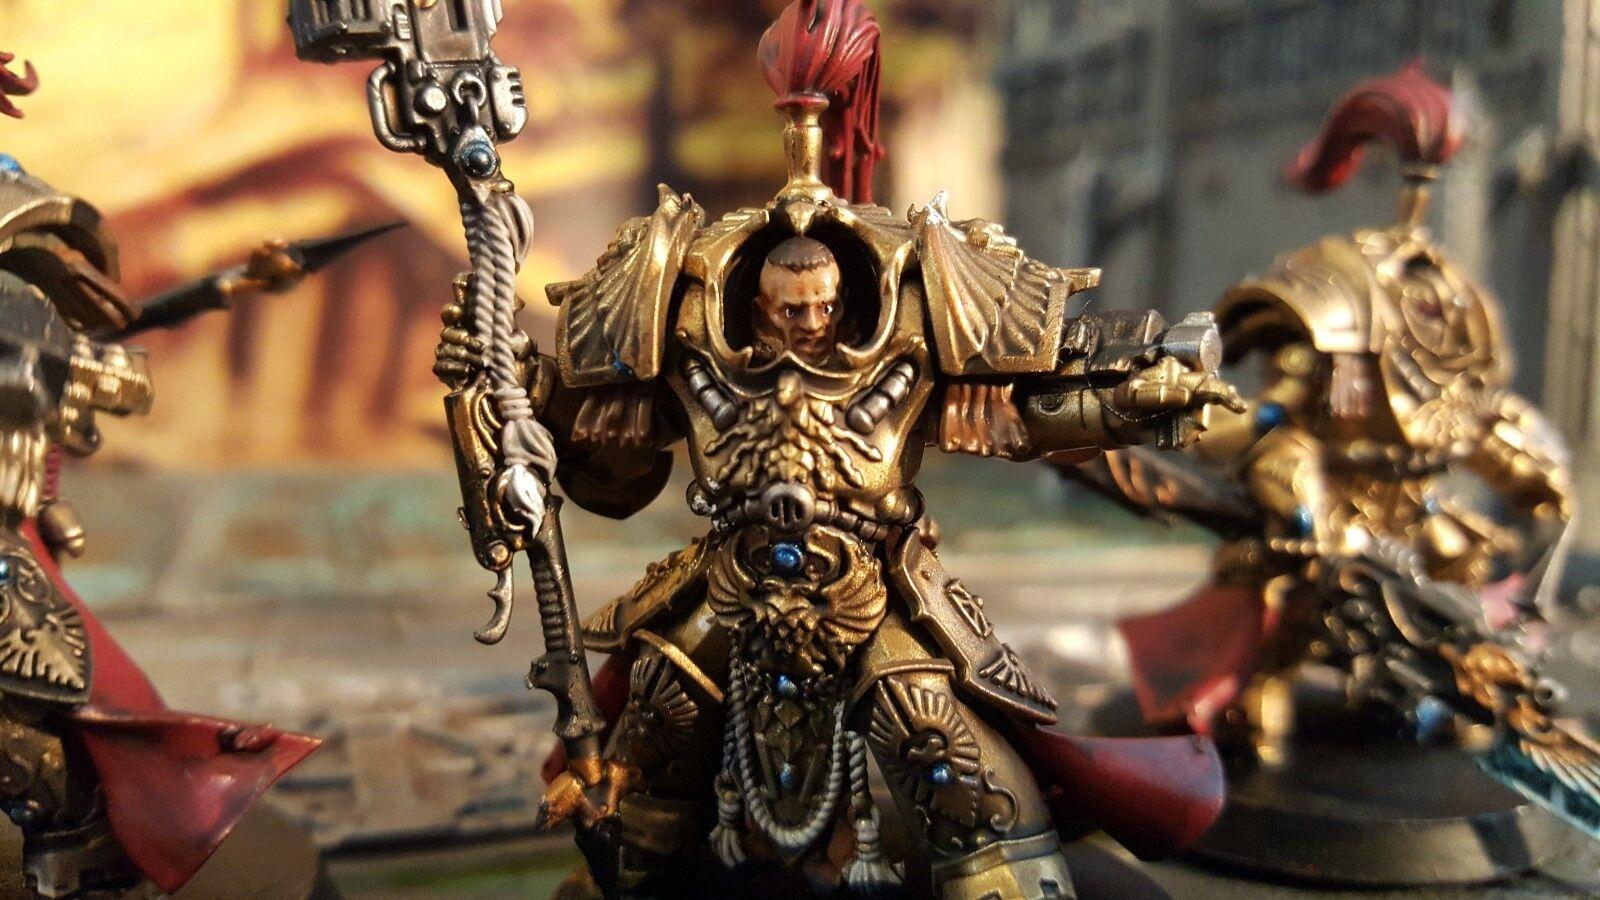 Warhammer 40k legio custodes custodes custodes custodian Allarus squad pro painted made to order c1ed4c